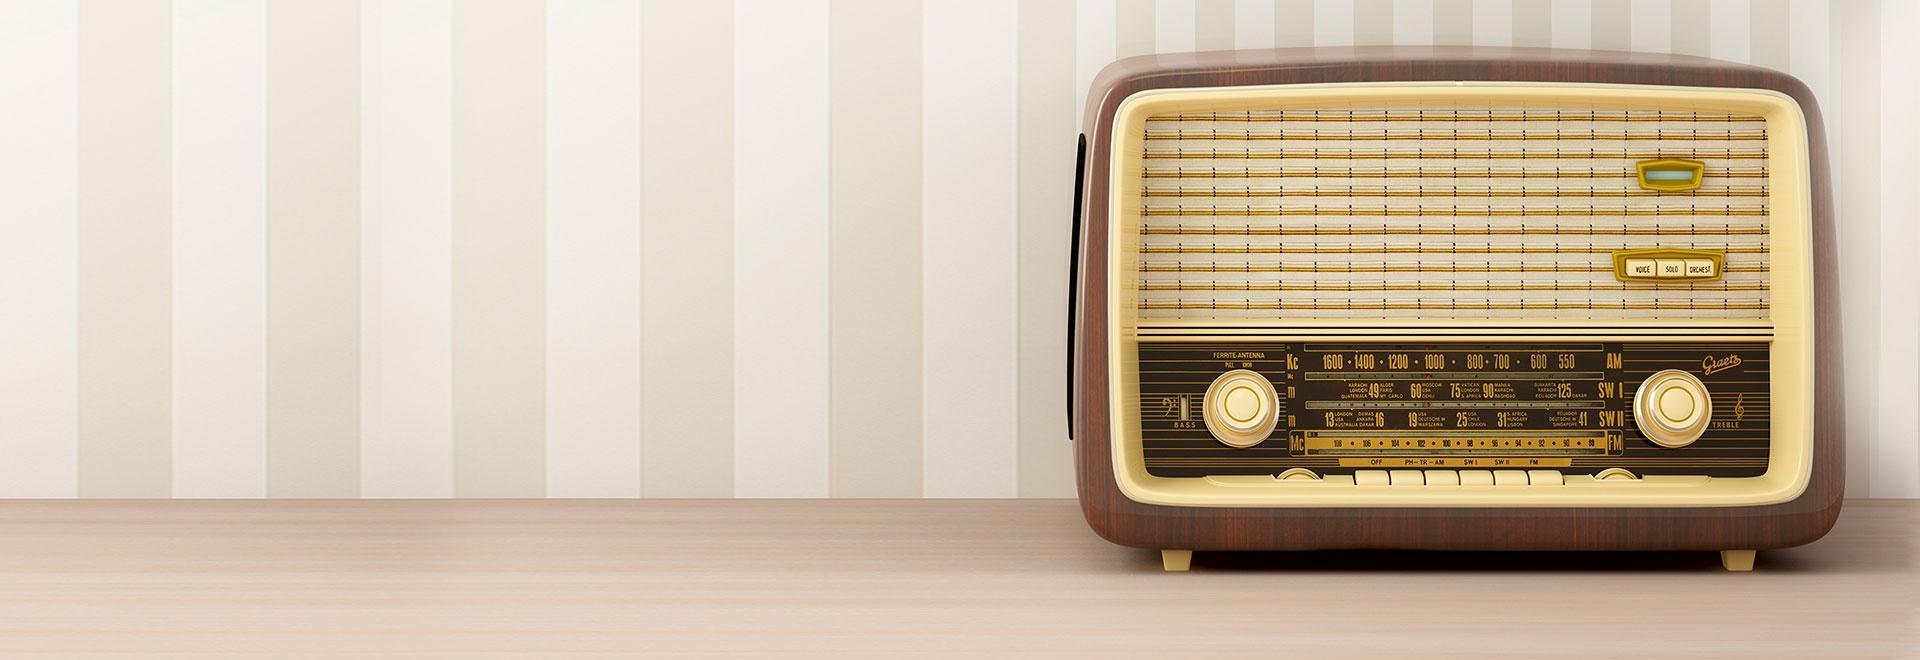 Riccardo Cucchi nativo radiofonico